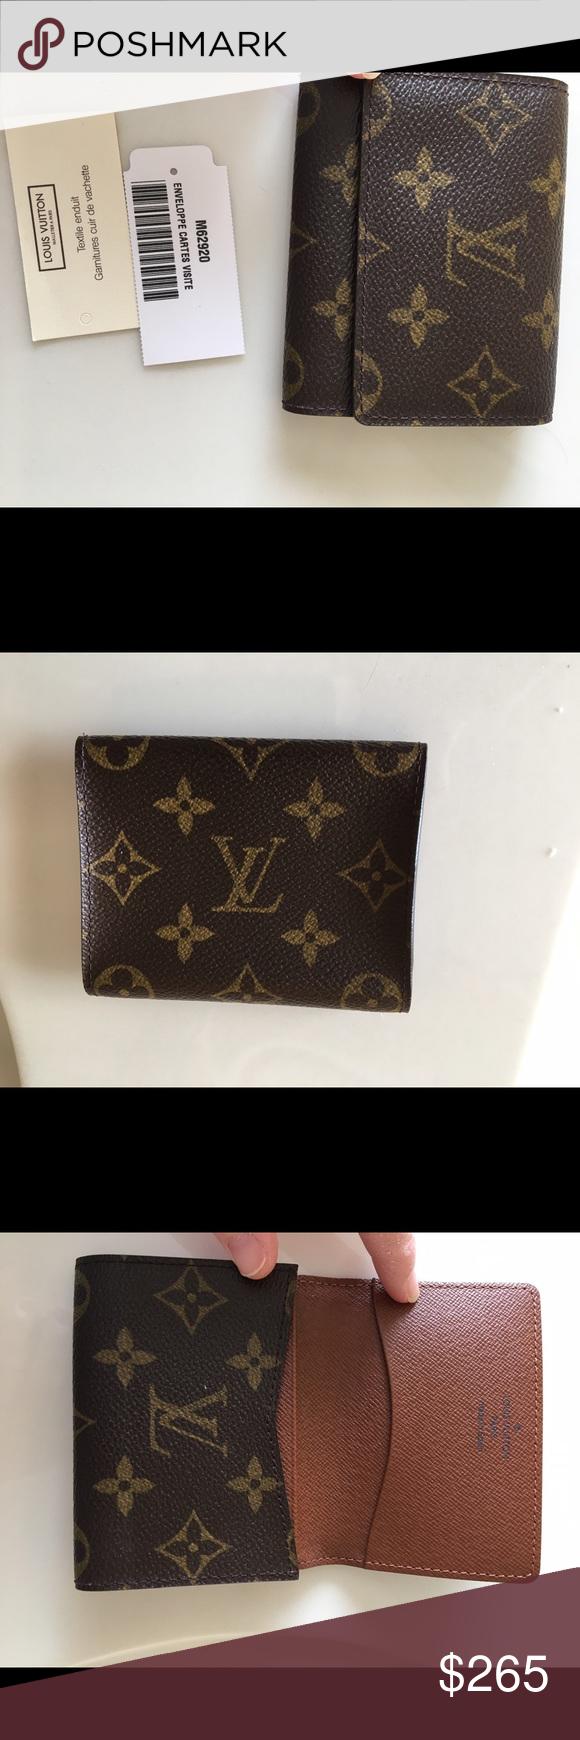 Authentic LV Enveloppe Cartes Visite De M62920 Made In Spain